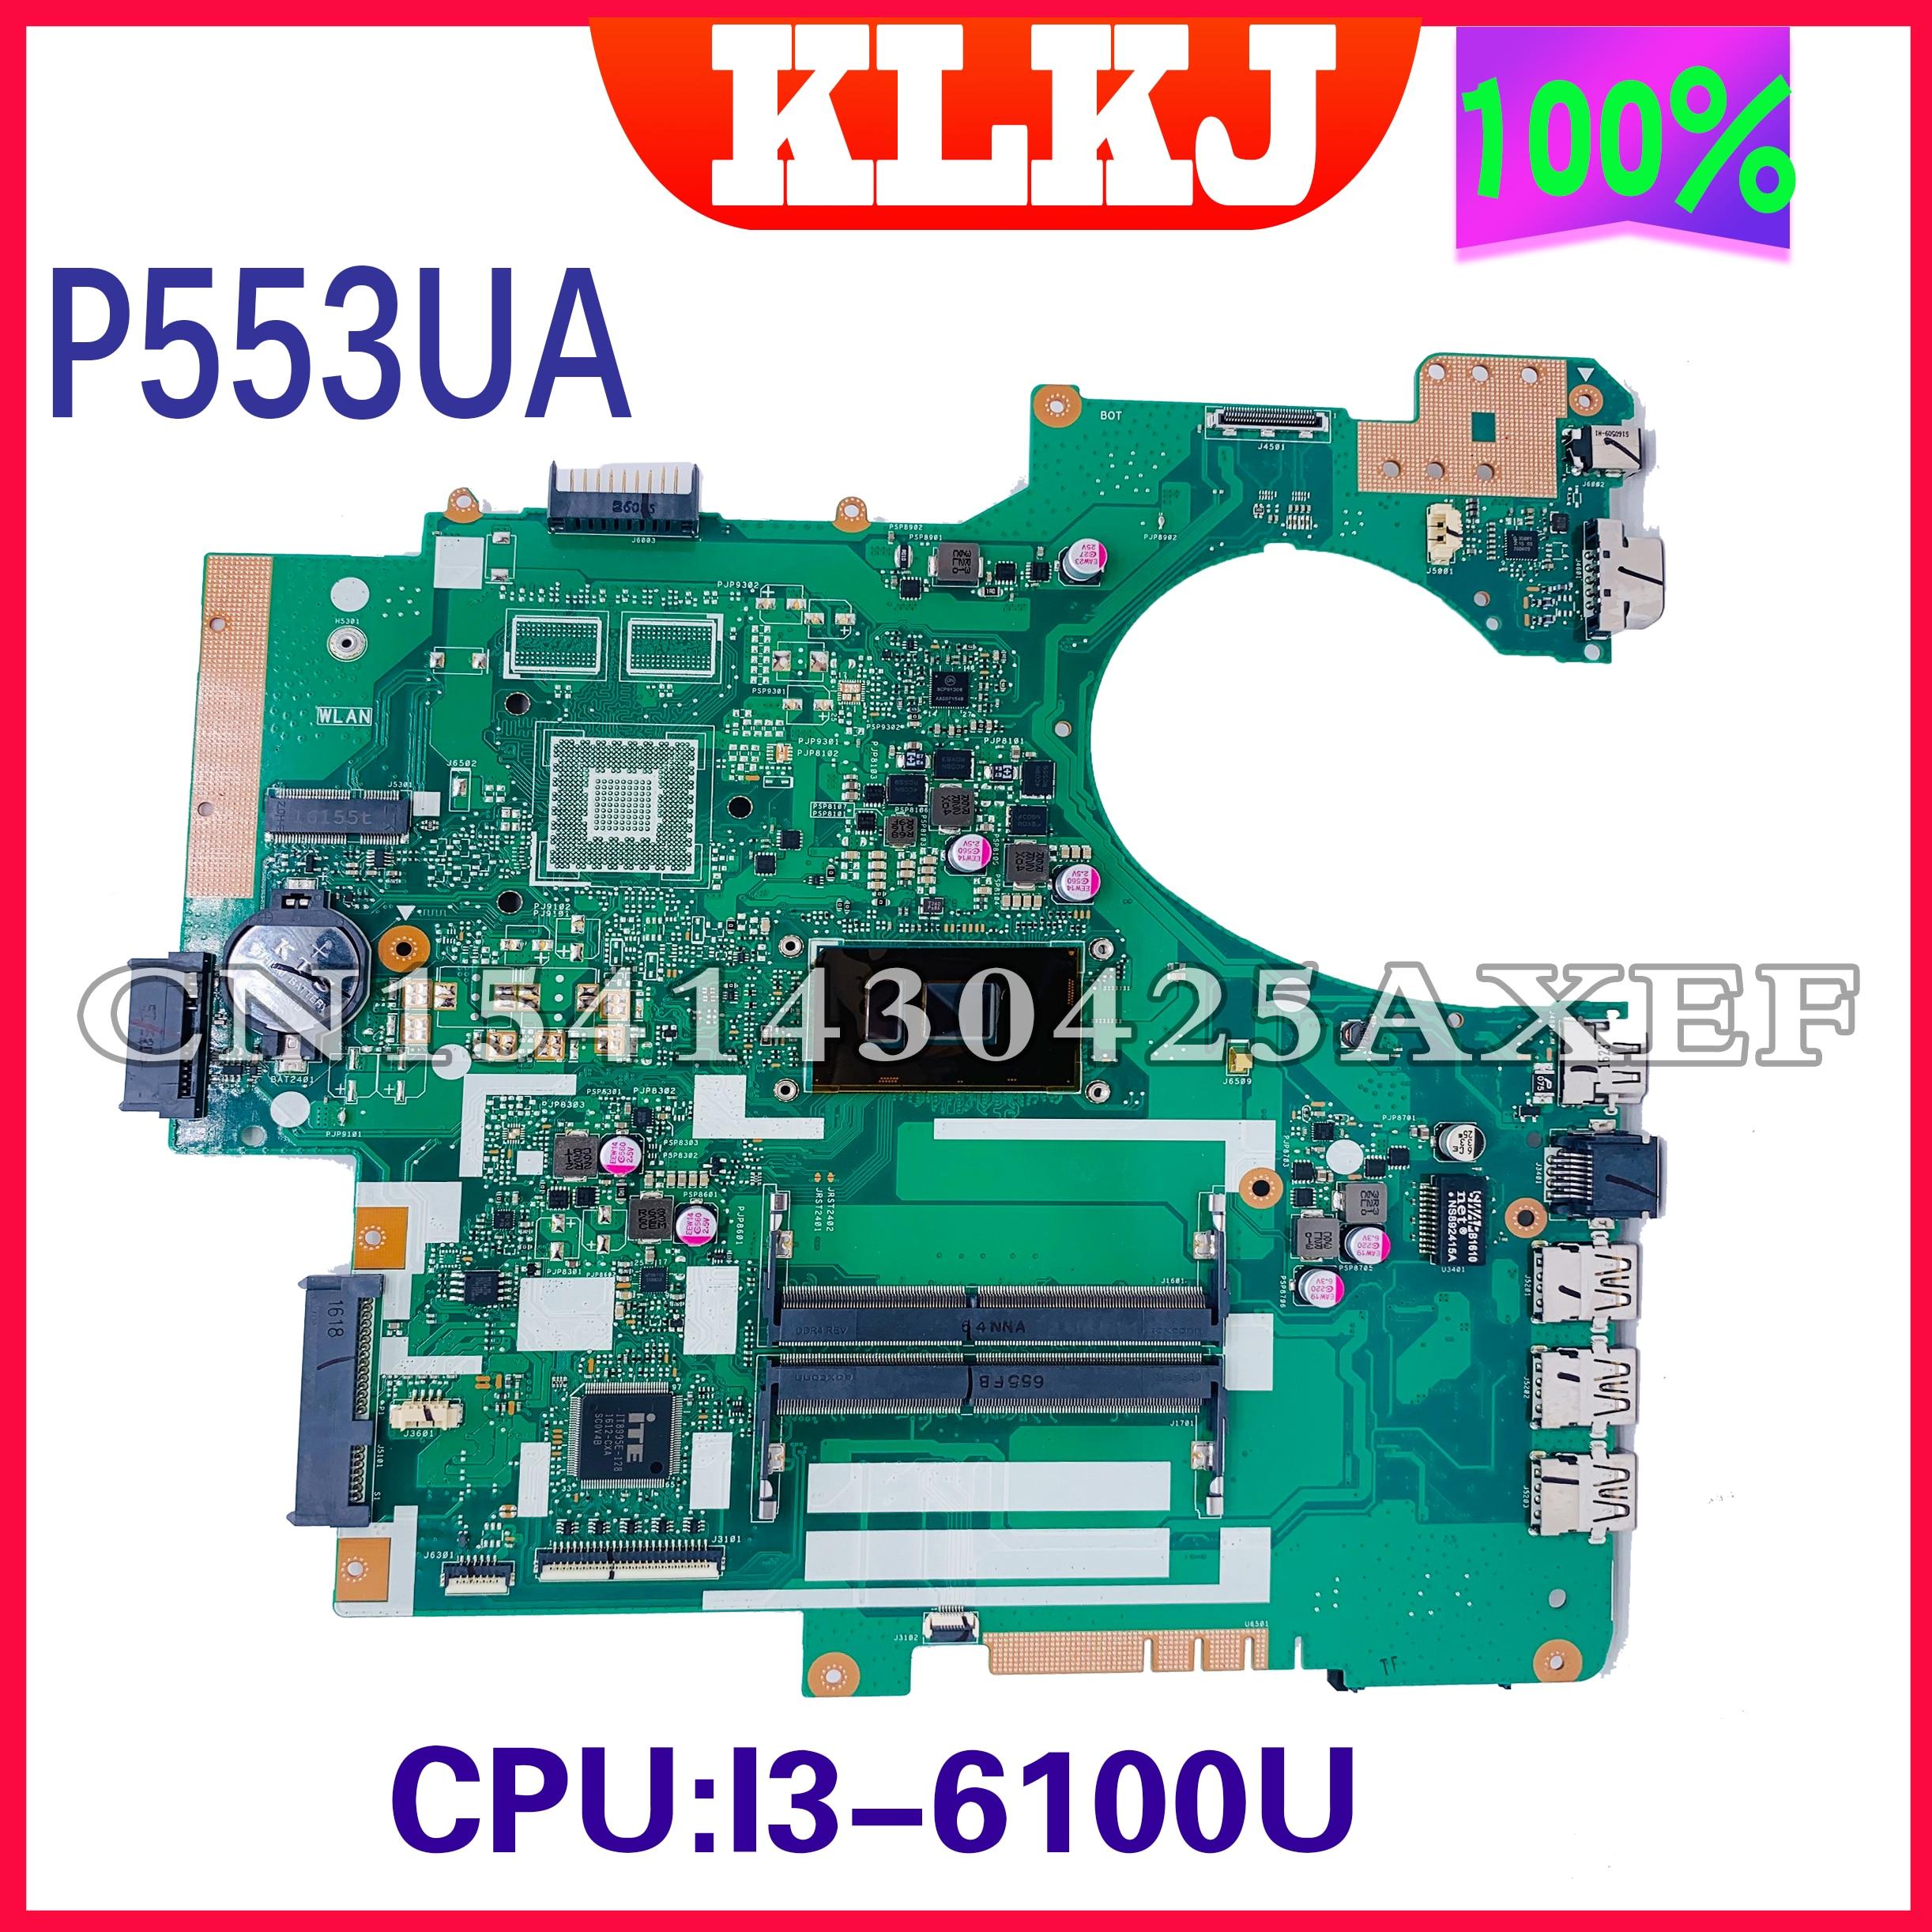 P553UJ اللوحة مناسبة ل ASUS P553UA P553 P553UJ PRO553J المحمول الأصلي اللوحة CPU I3-6100U 100% تعمل بشكل جيد